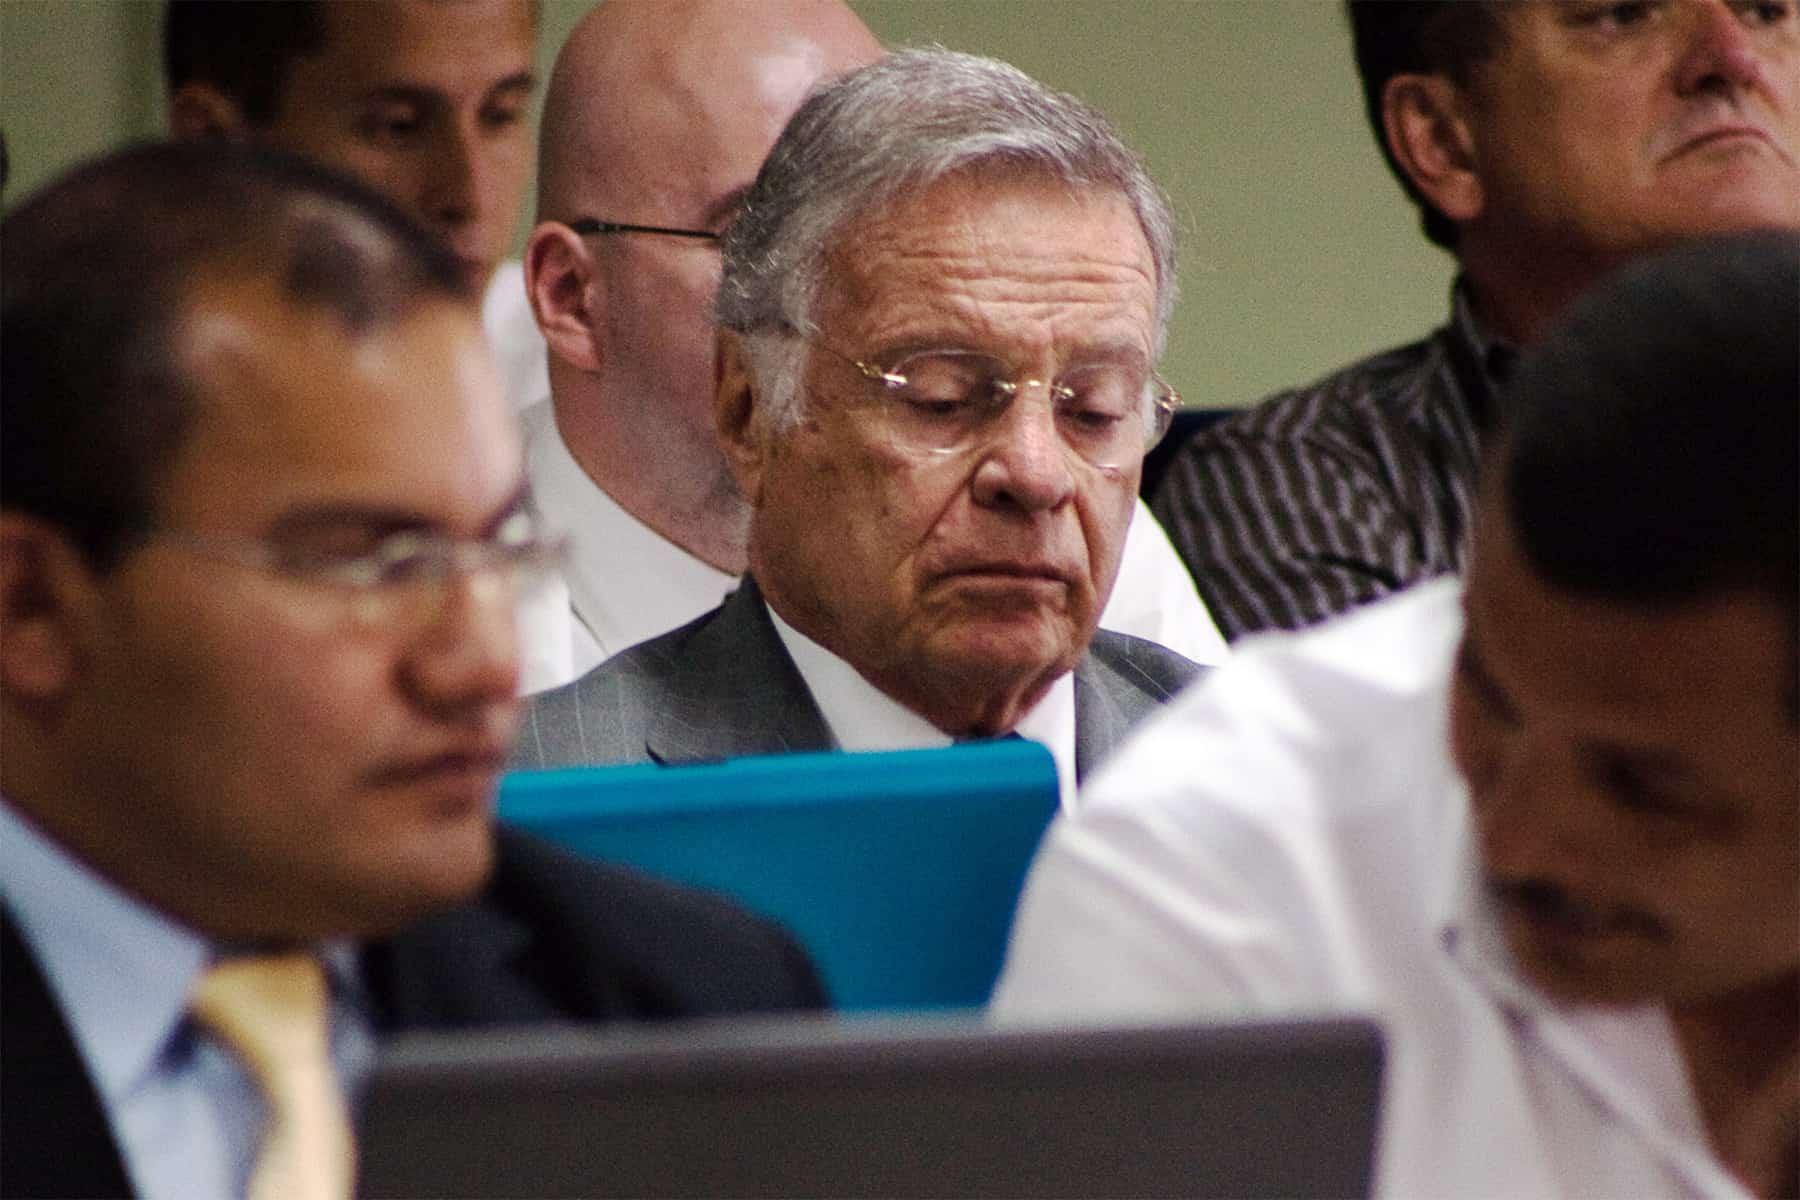 Ex president Miguel Ángel Rodríguez